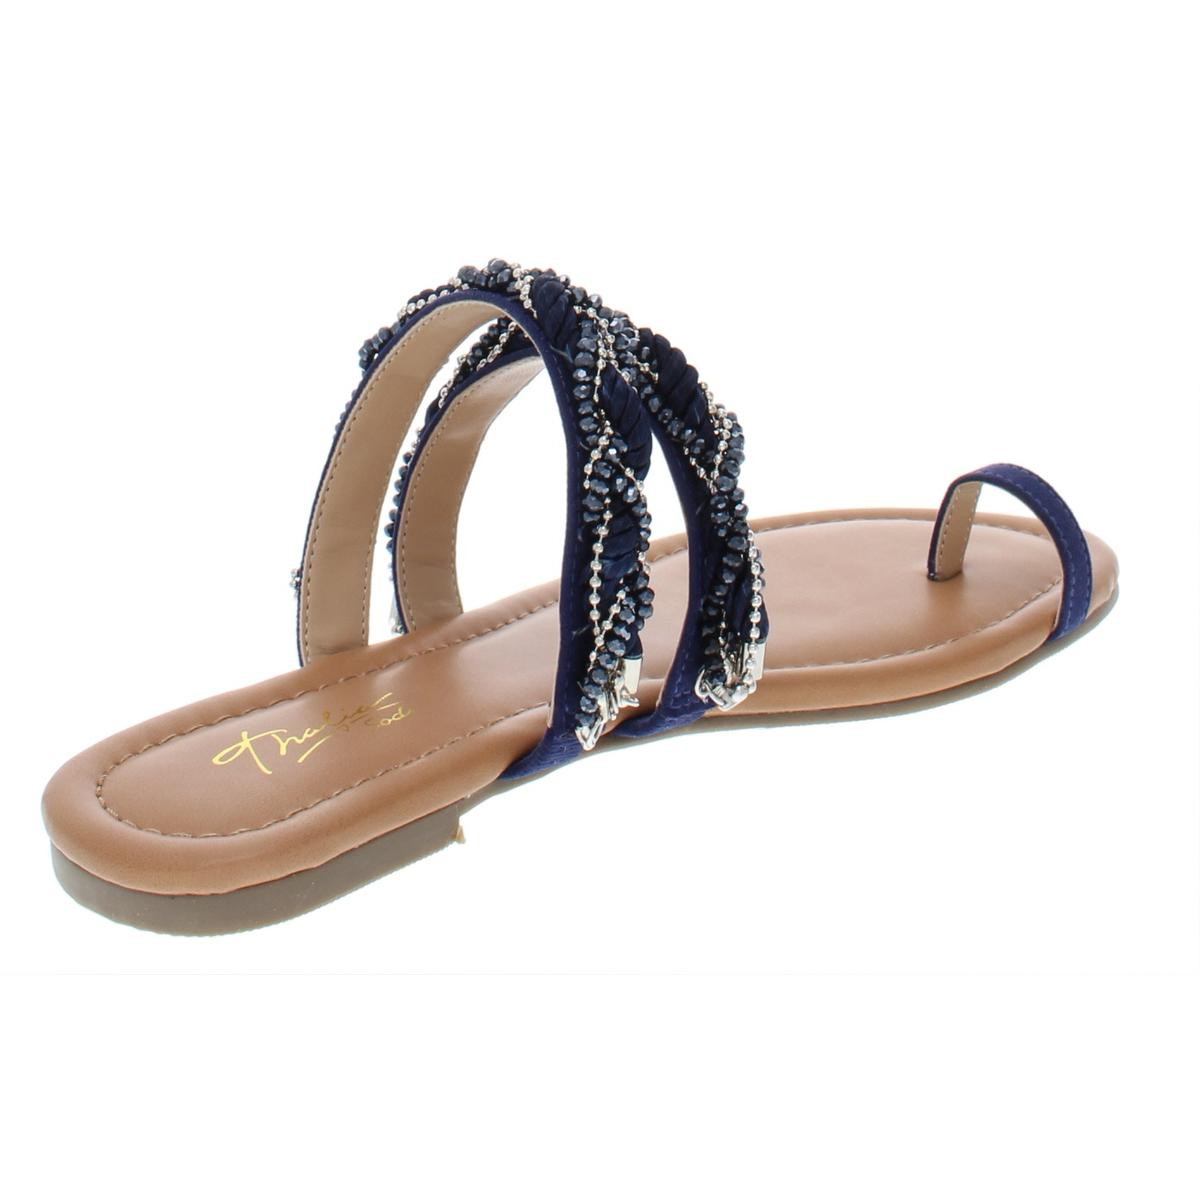 Thalia-Sodi-Womens-Jaelah-Toe-Ring-Microsuede-Dress-Flat-Sandals-Shoes-BHFO-7192 thumbnail 4